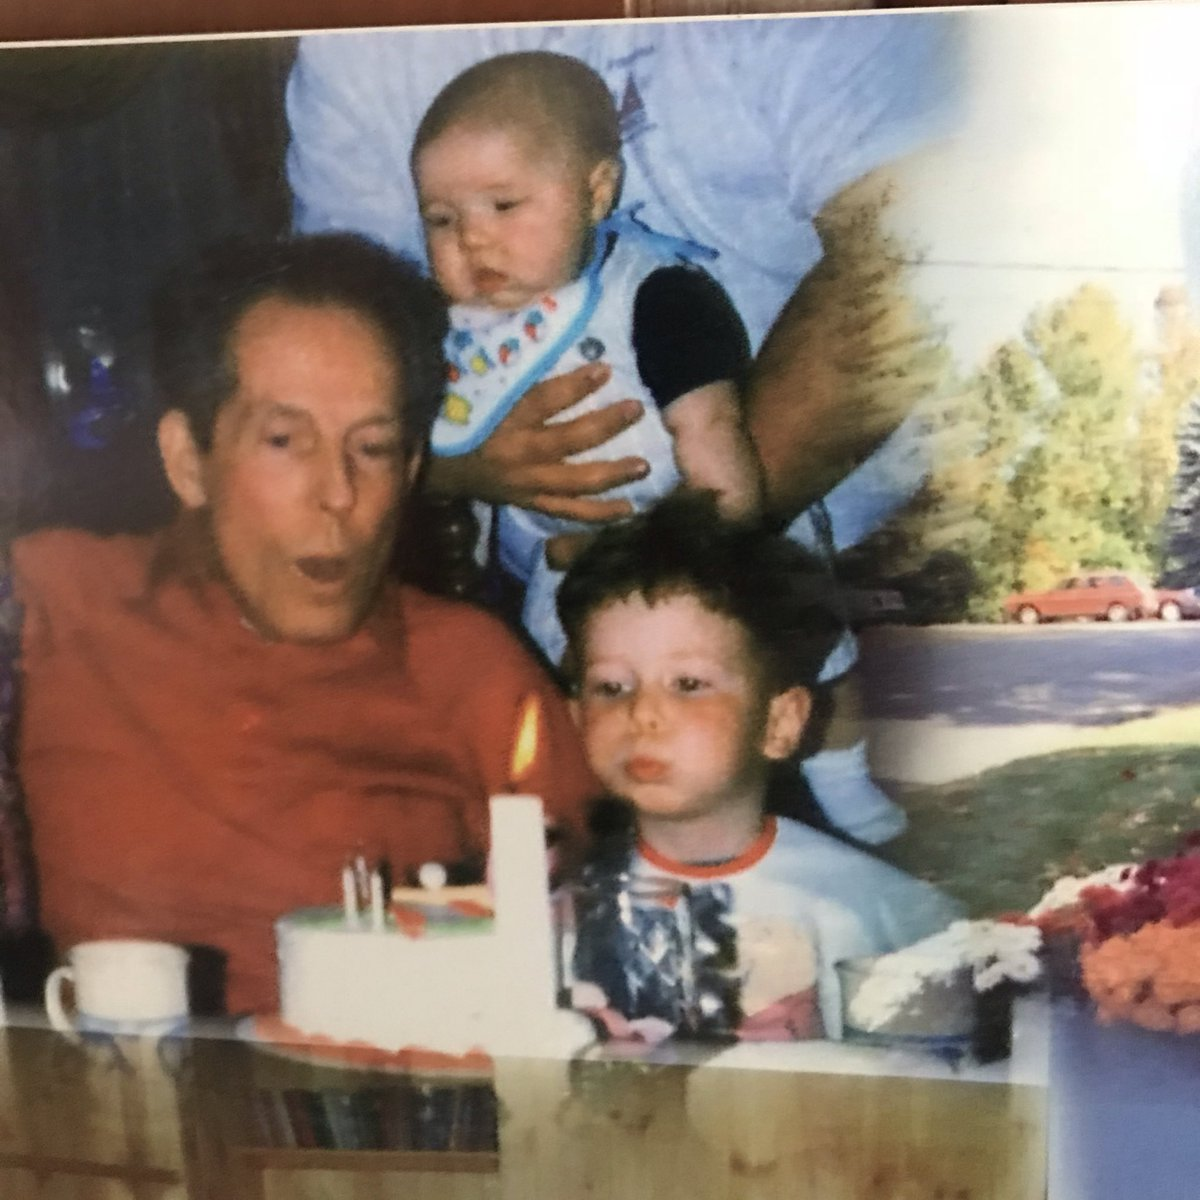 #EndALZ Love you Grampy twitter.com/alzassociation…